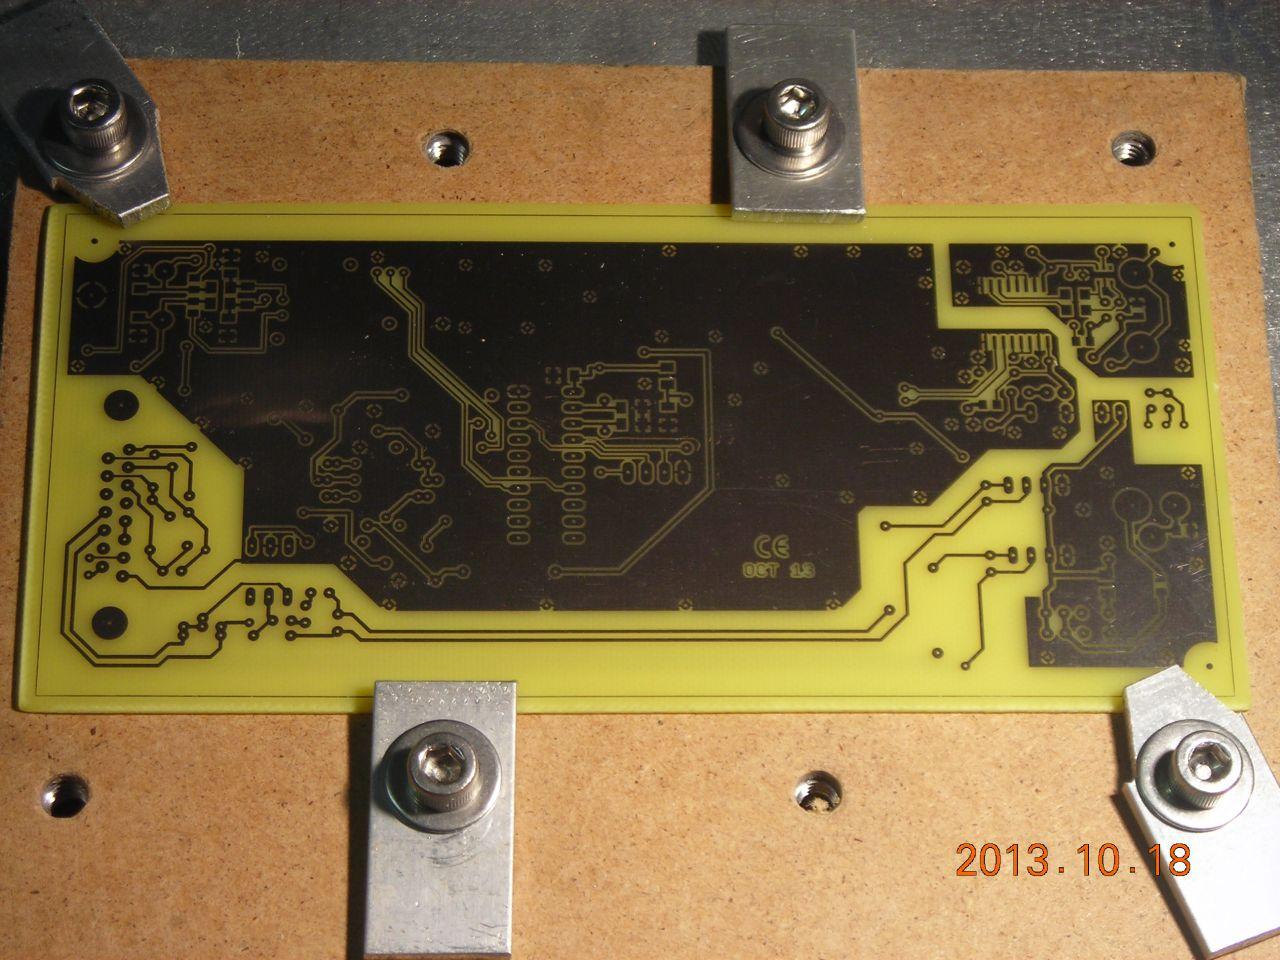 Cnc Printed Circuit Board Pcb Drilling Machine By Rey15315